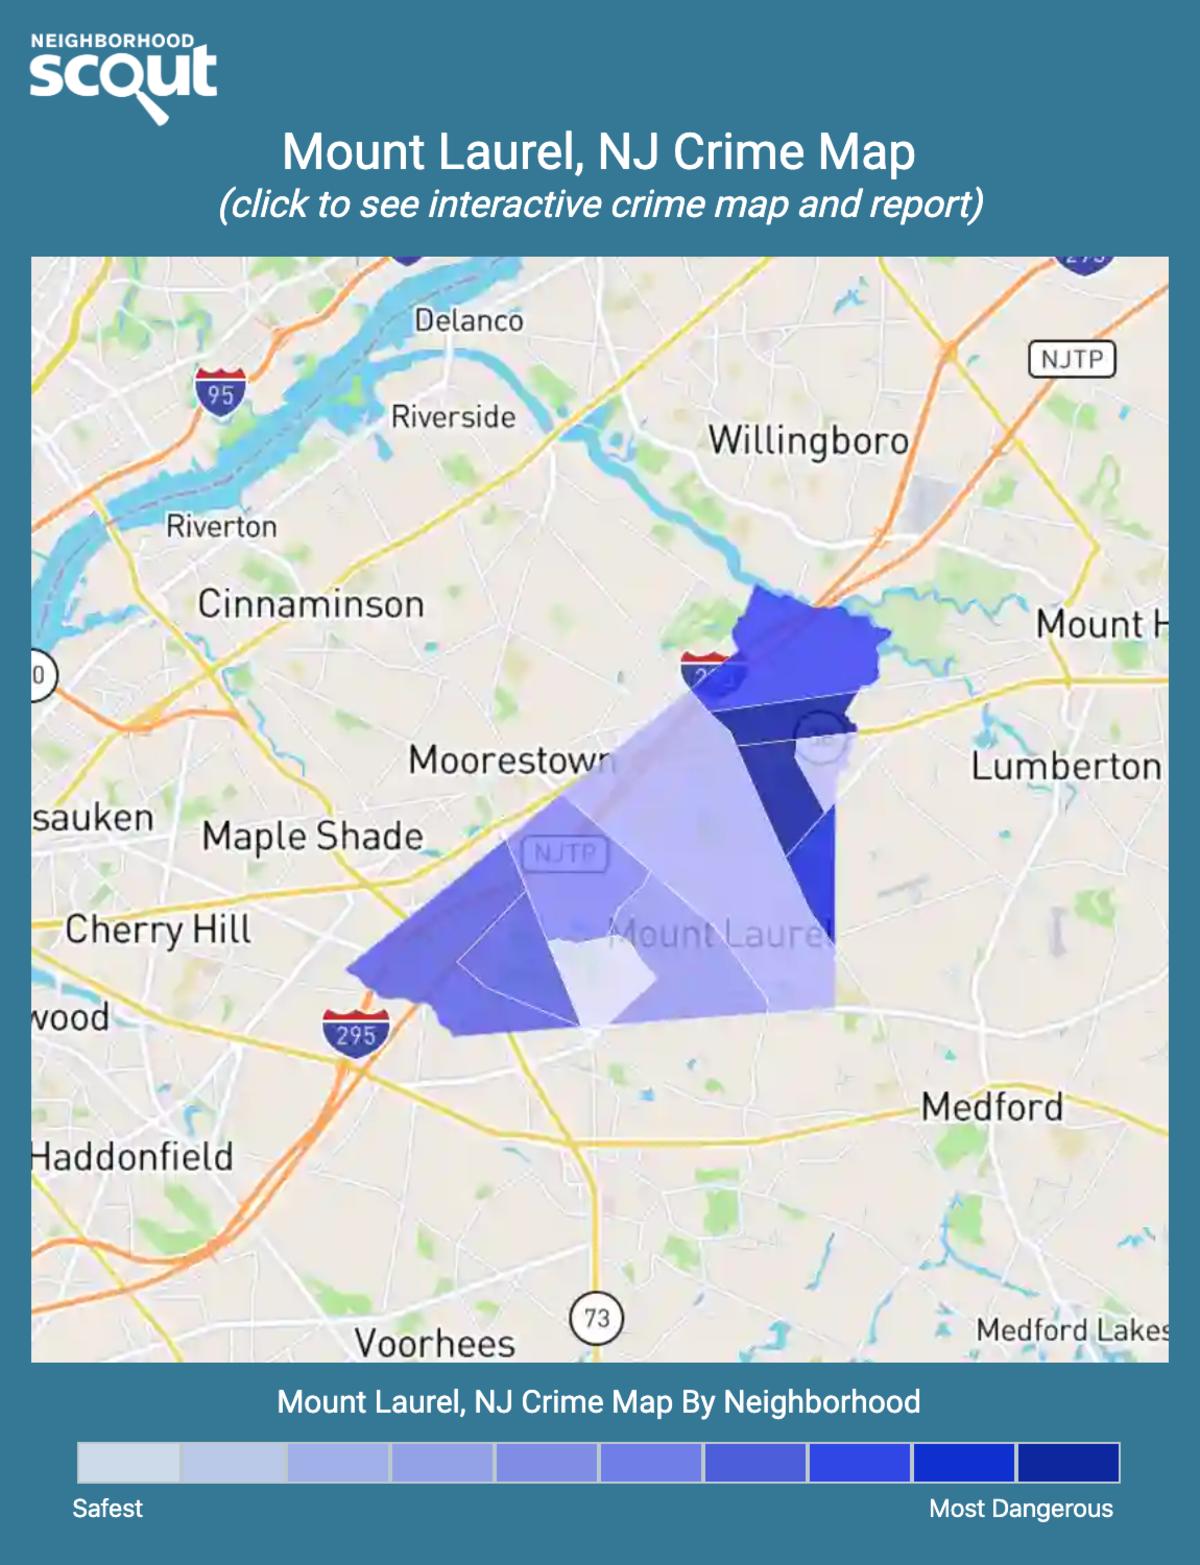 Mount Laurel, New Jersey crime map